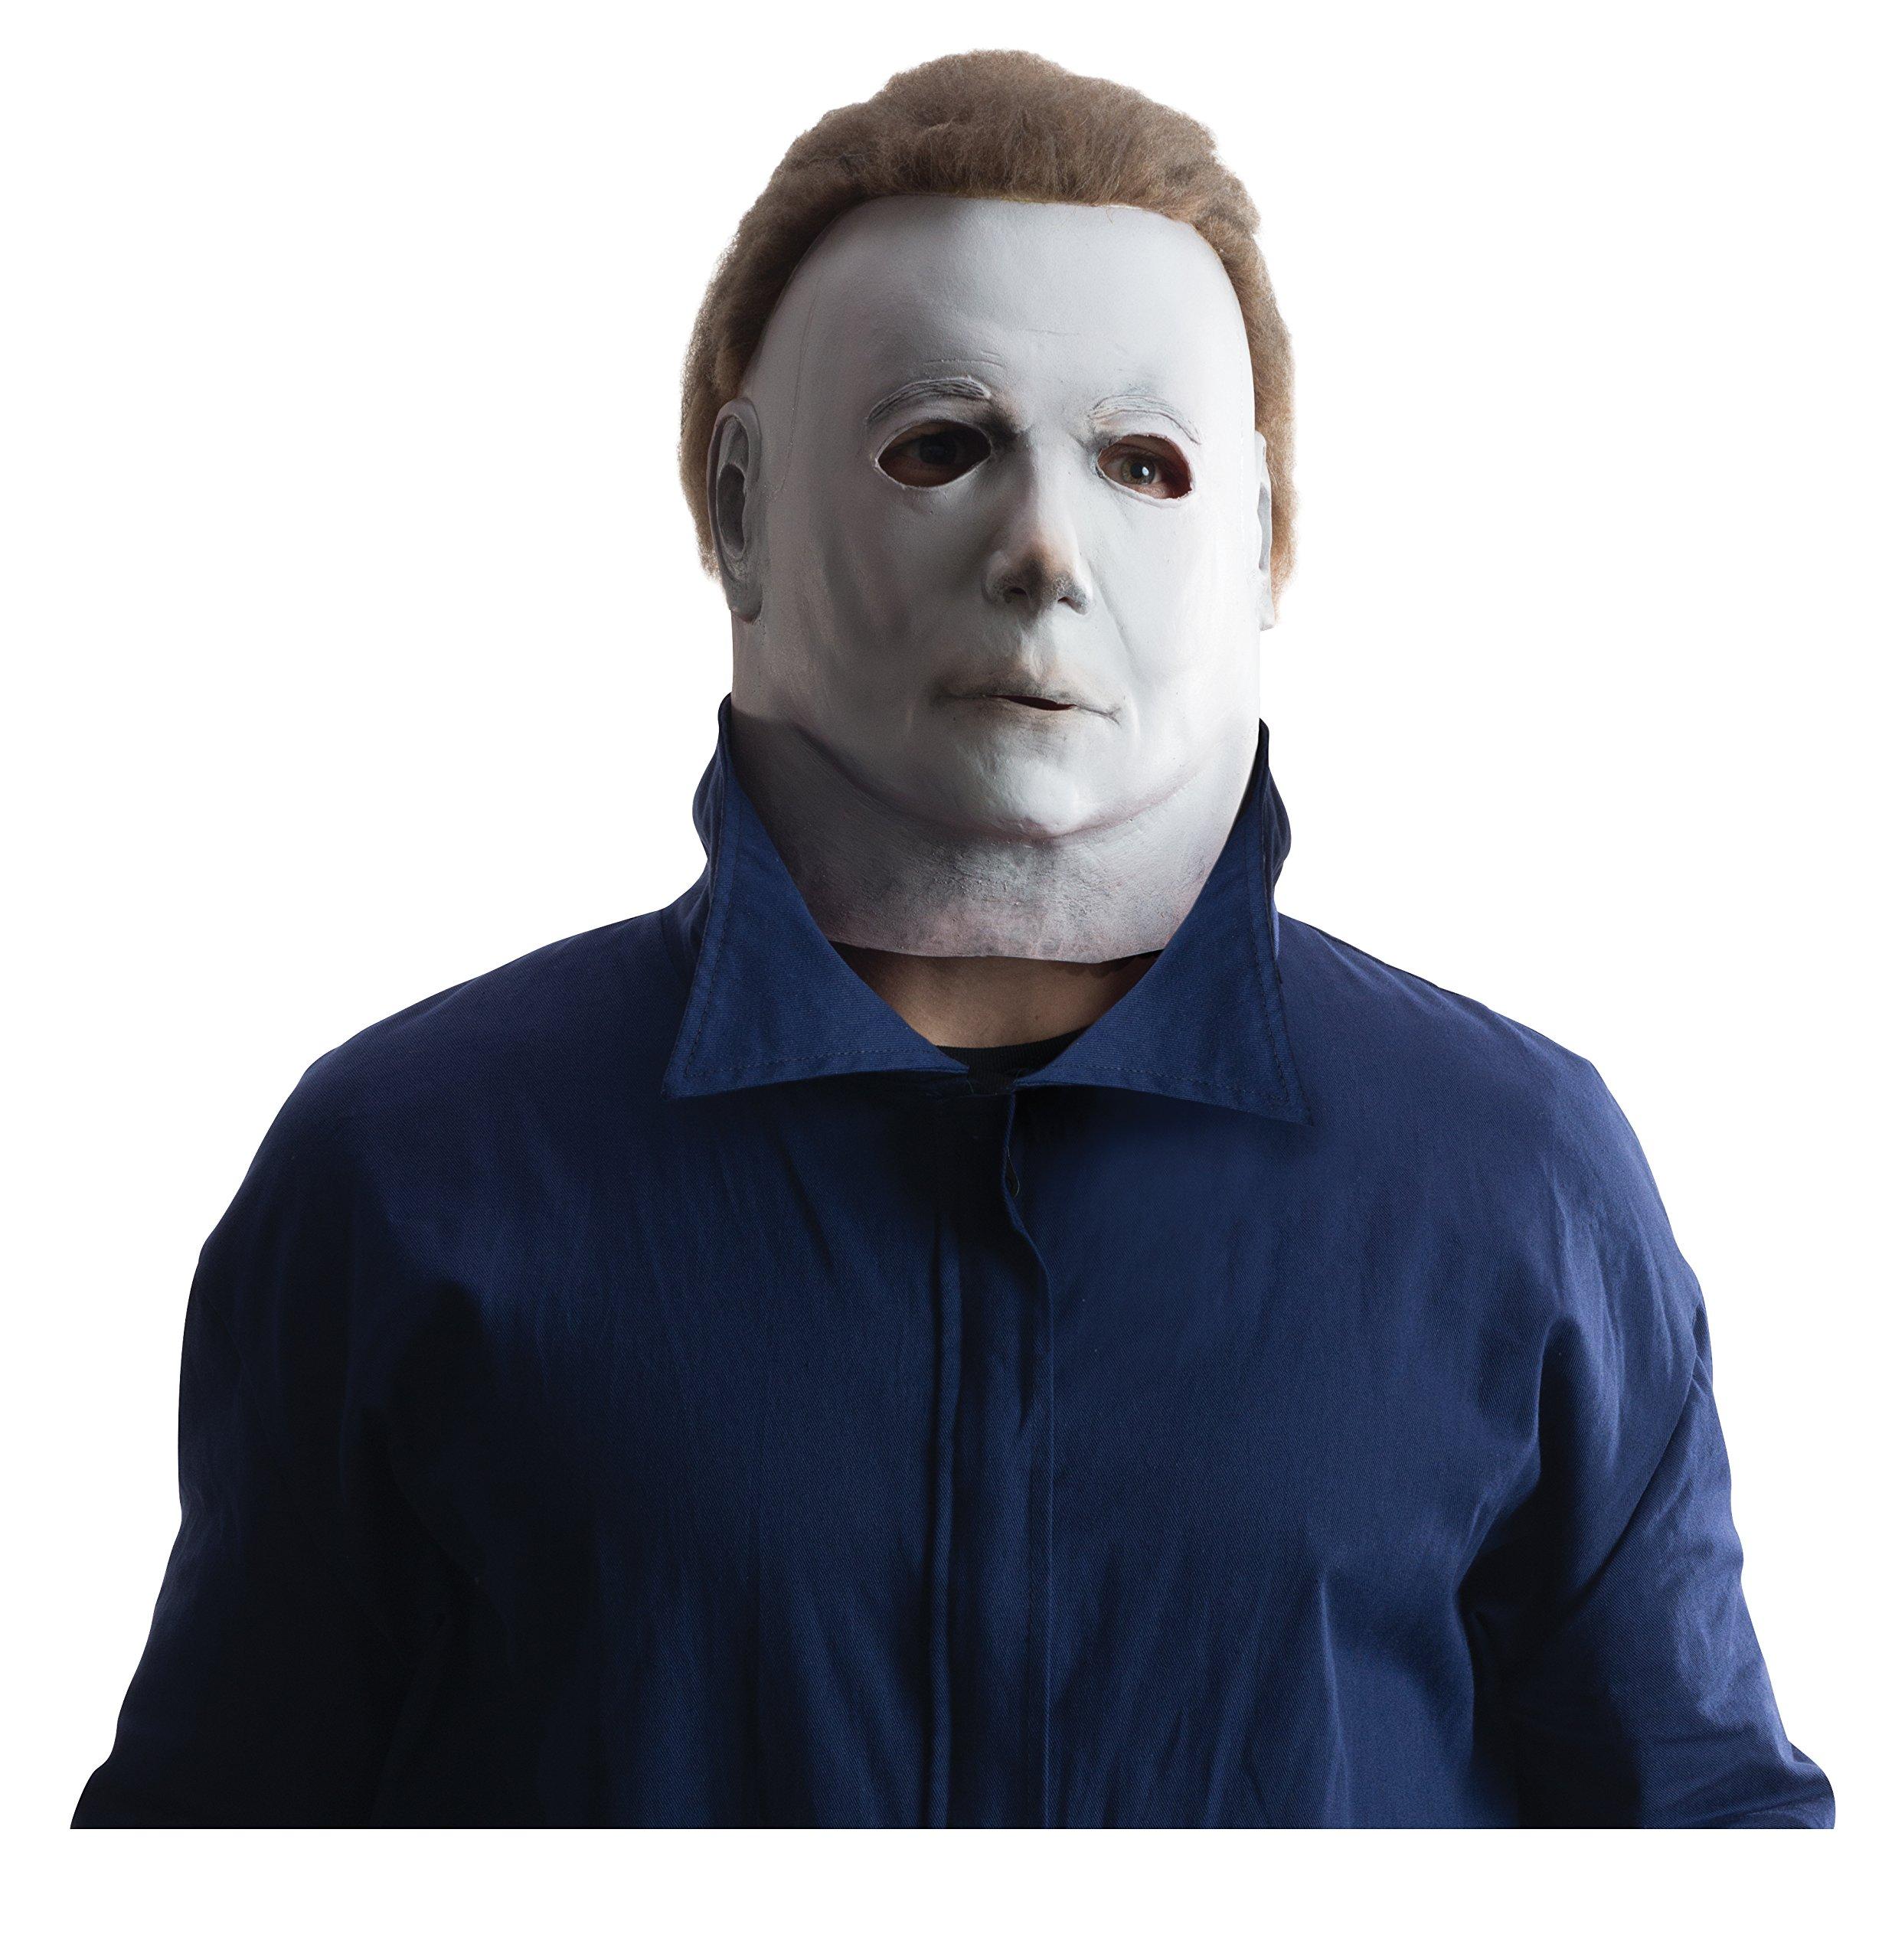 Rubie's Men's Deluxe Overhead Michael Myers Mask, Multi, One Size